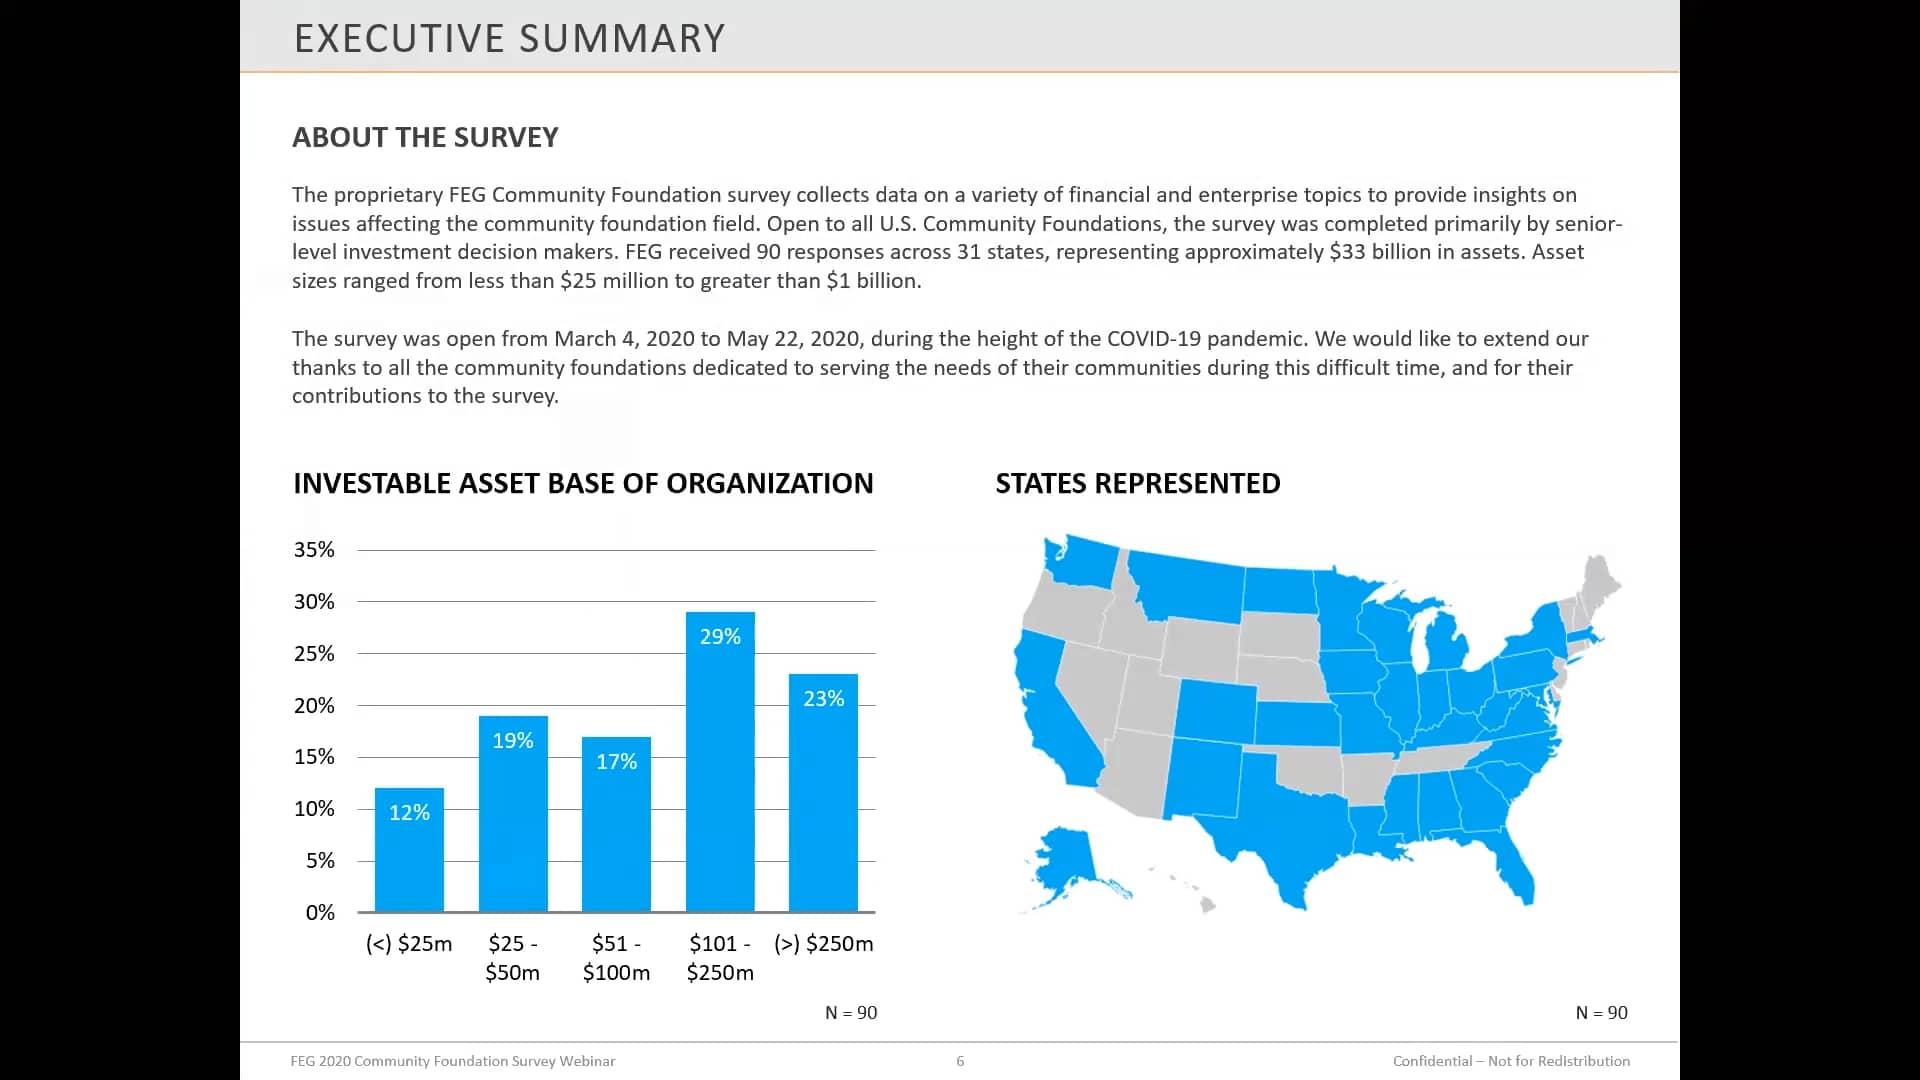 Webinar Replay: FEG 2020 Community Foundation Survey